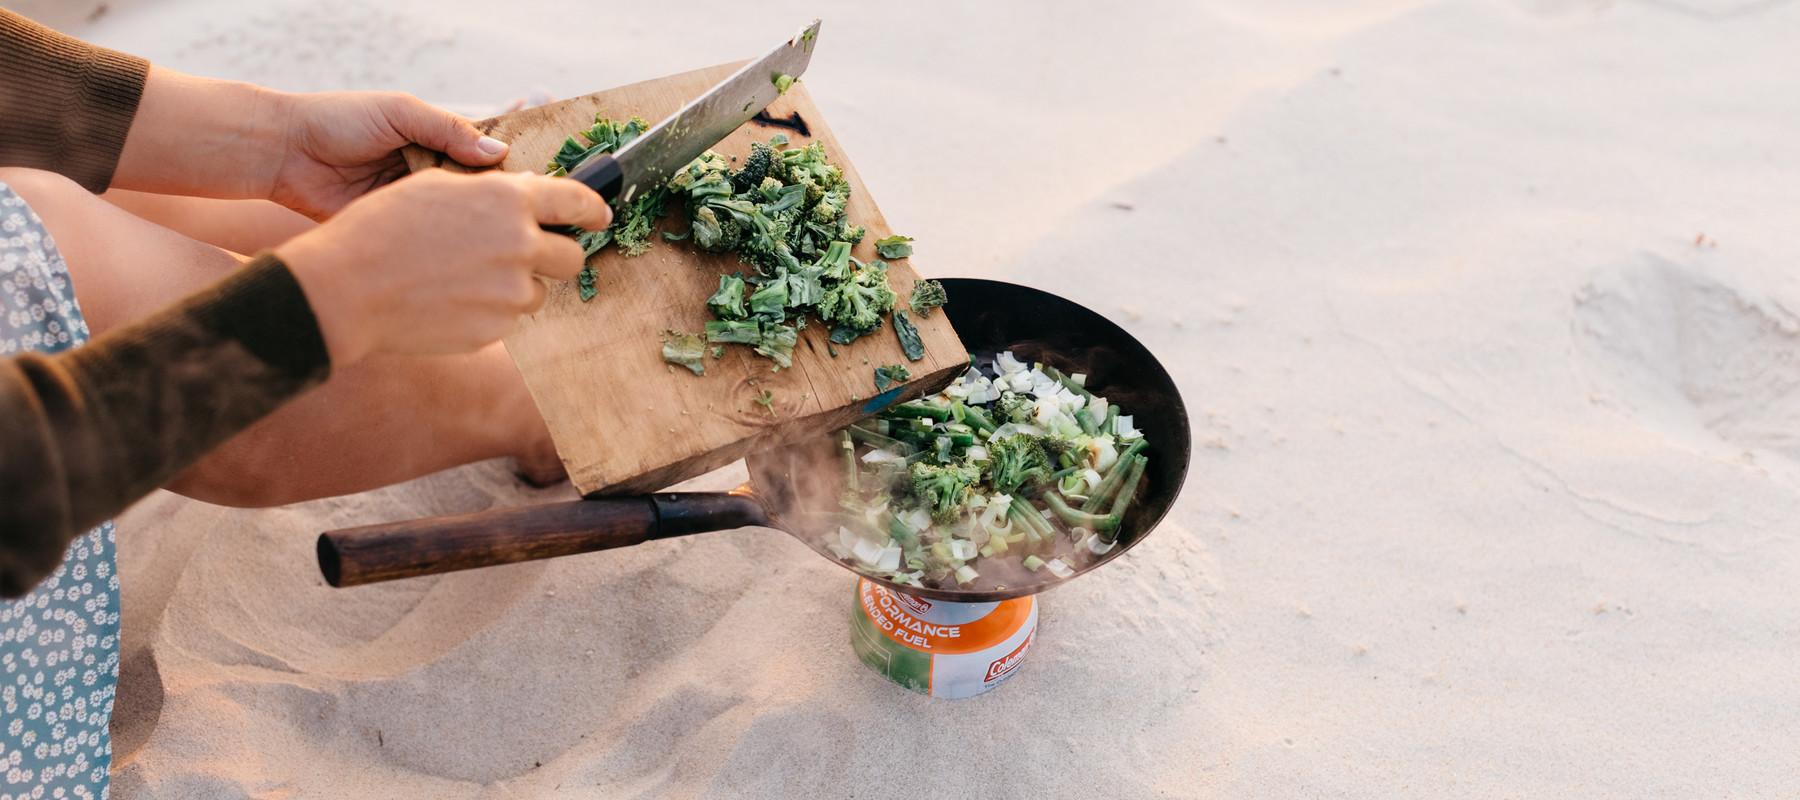 9ca5e6321b58c4891ae55375c1df05910f1f872a_recipe-food-fried-greens-smoked-bacon-eggs-beach-cooking-cutting-prep.jpg